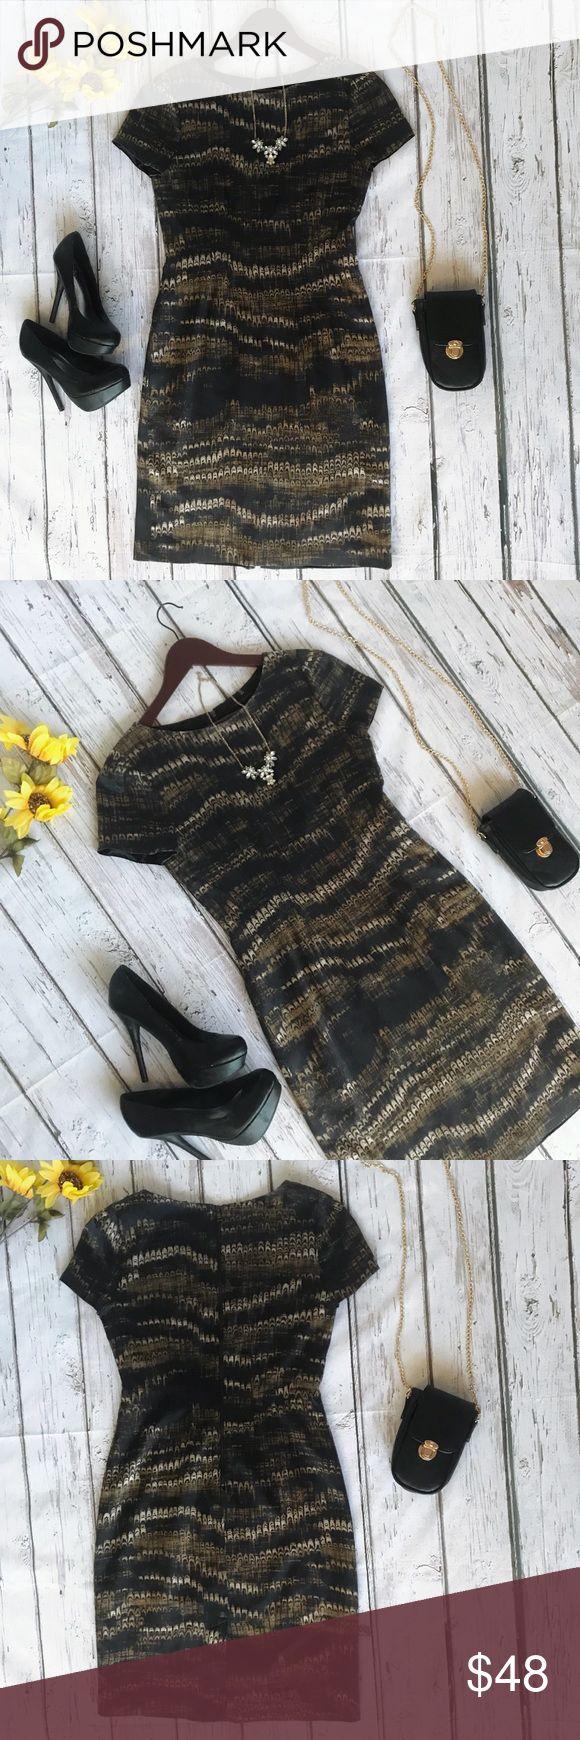 ✨Elie Tahari silk dress! Sz 4 ✨ Flawless used condition Elie Tahari 93% silk dress! Perfect for the office or a night out! 🎀✨😍 Elie Tahari Dresses Midi